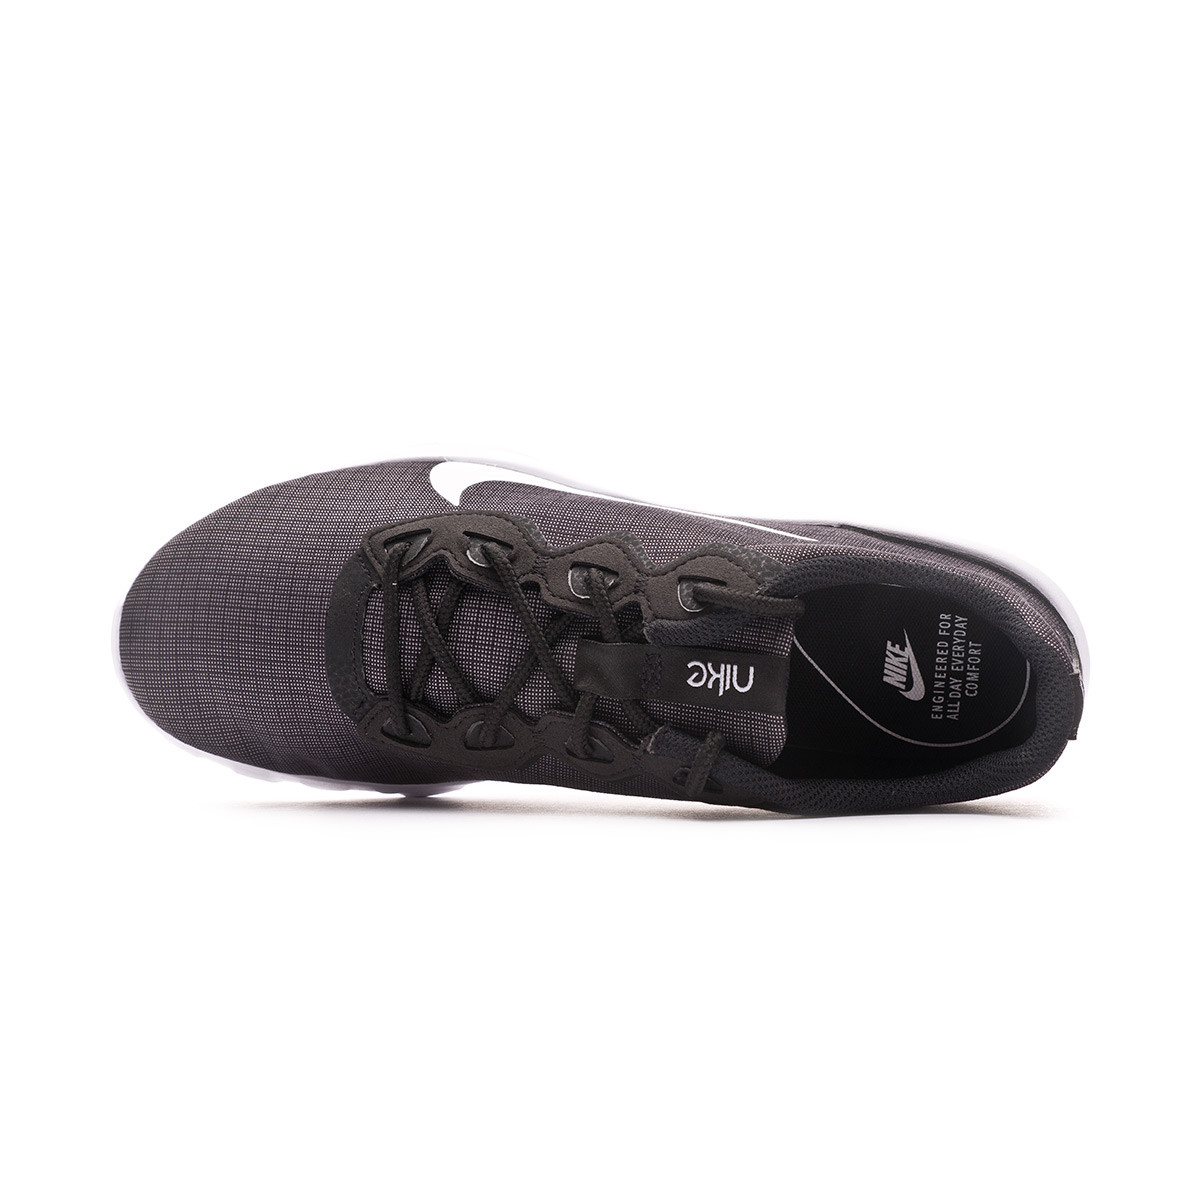 Trainers Nike Explore Strada Black